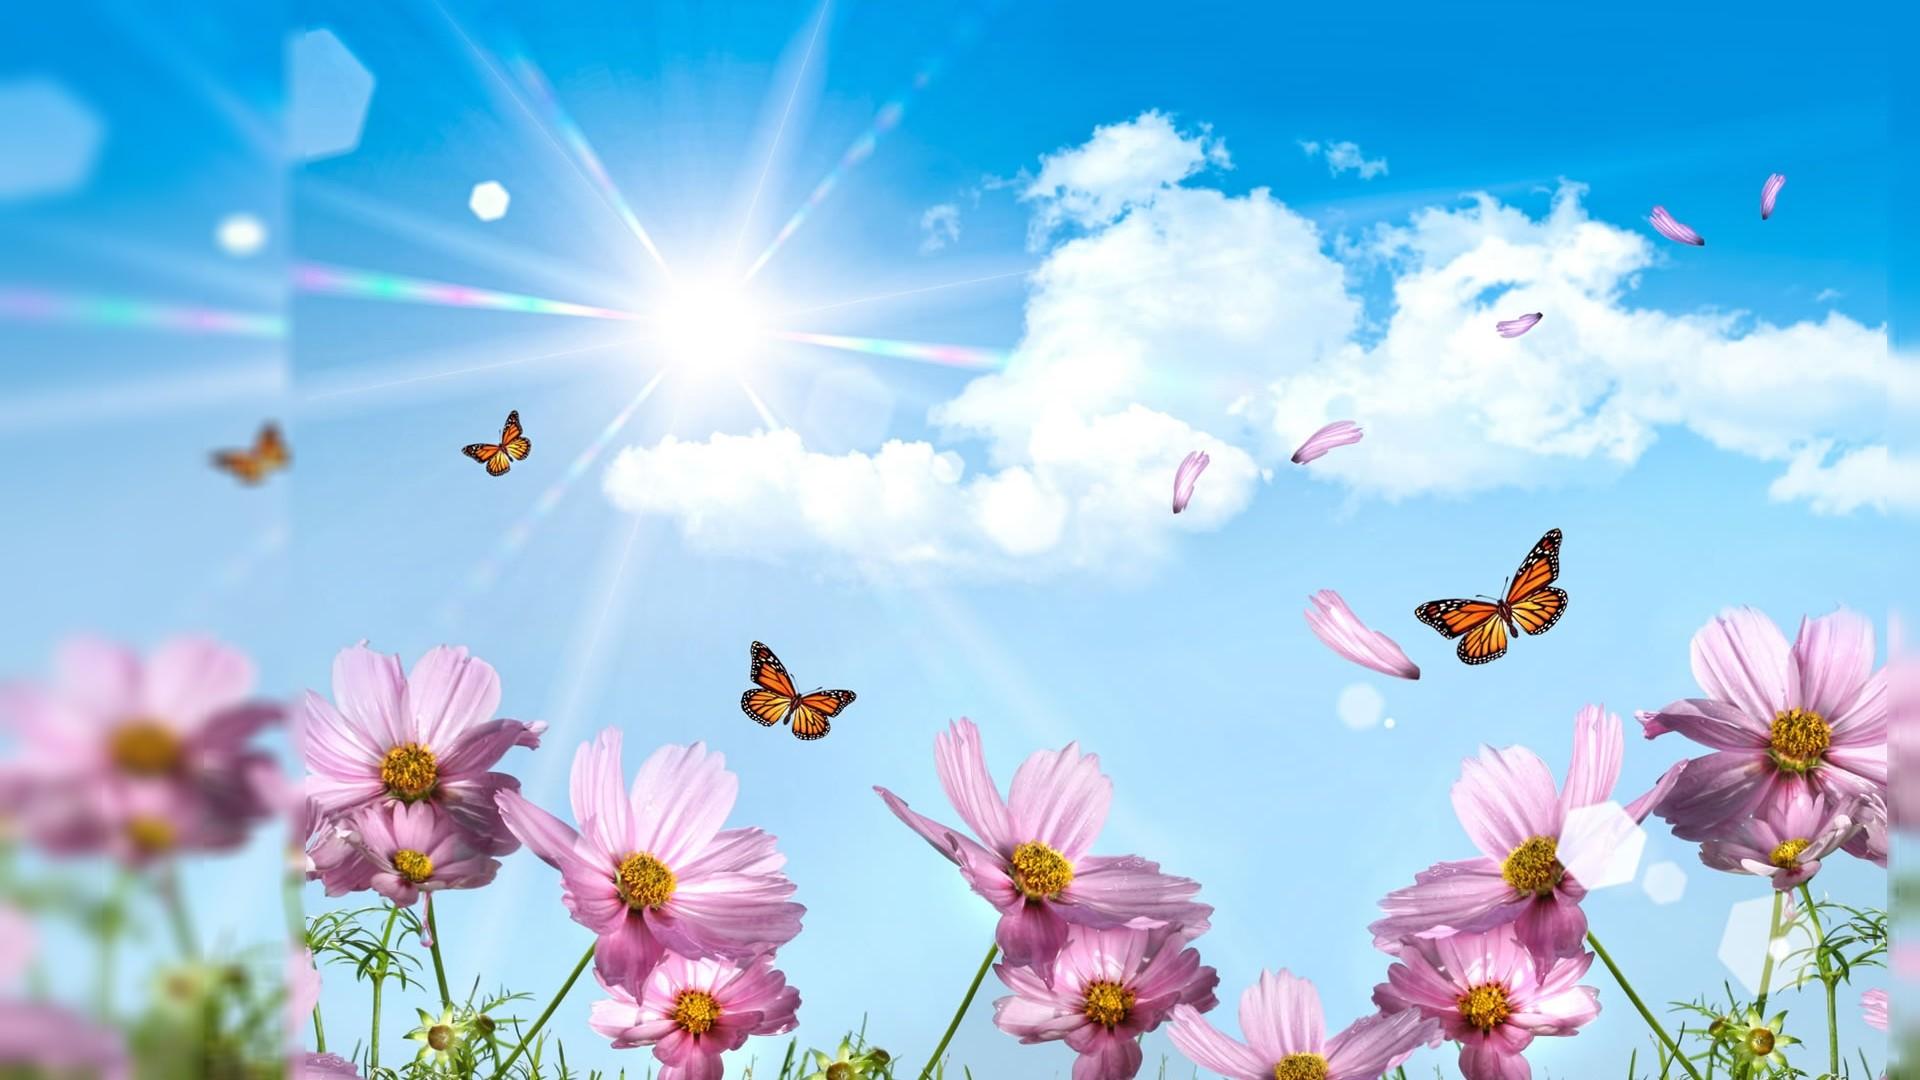 1920×1080-free-summer-desktop-wallpaper-1508645640